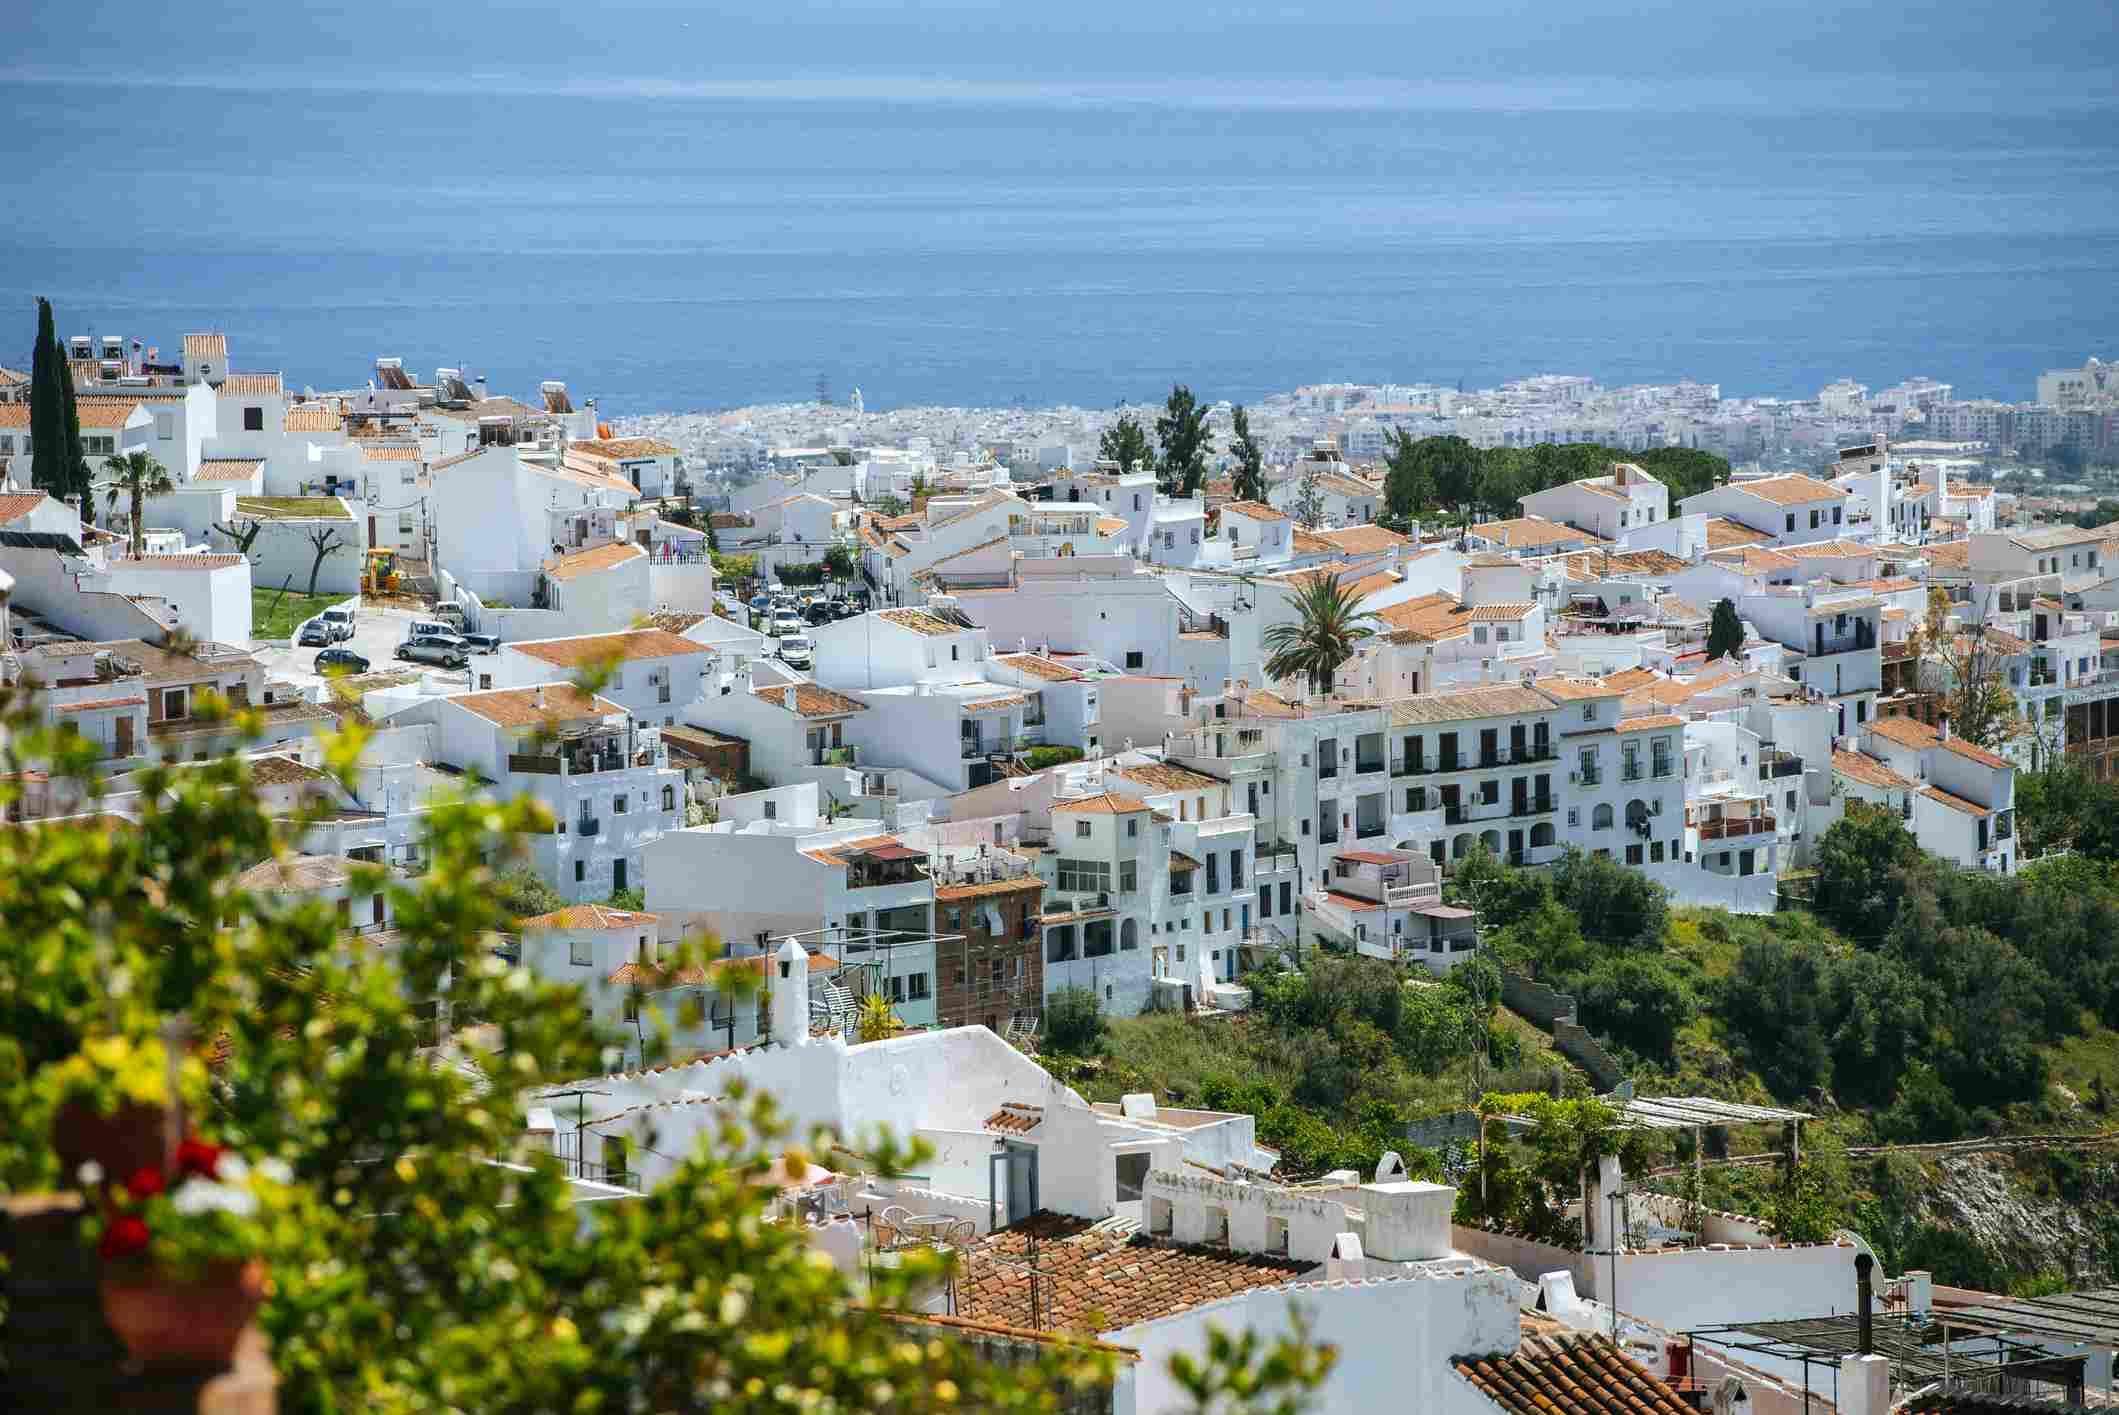 Spain, Andalusia, Province of Malaga, Frigiliana, white town on the Costa del Sol